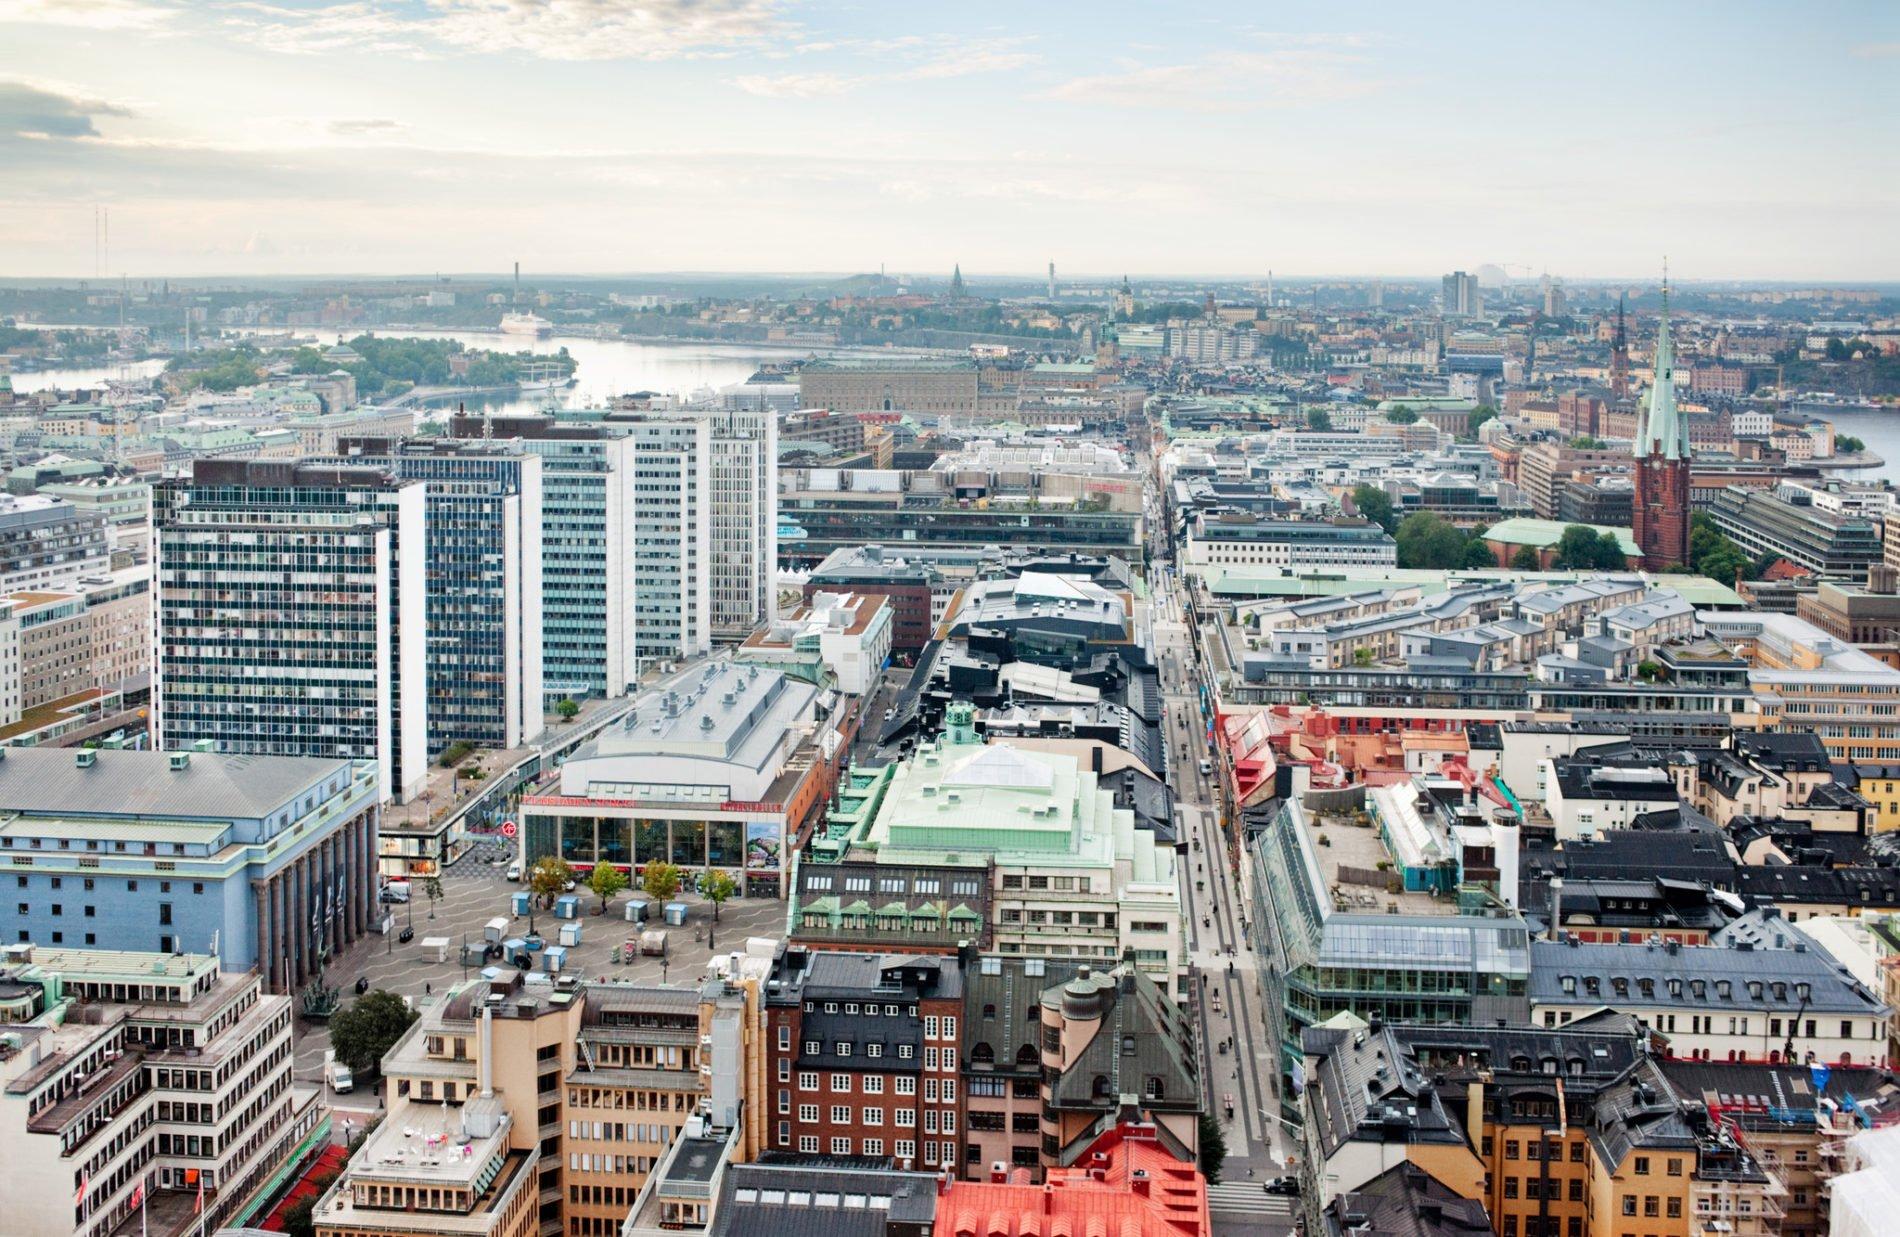 Flygbild över Stockholm city